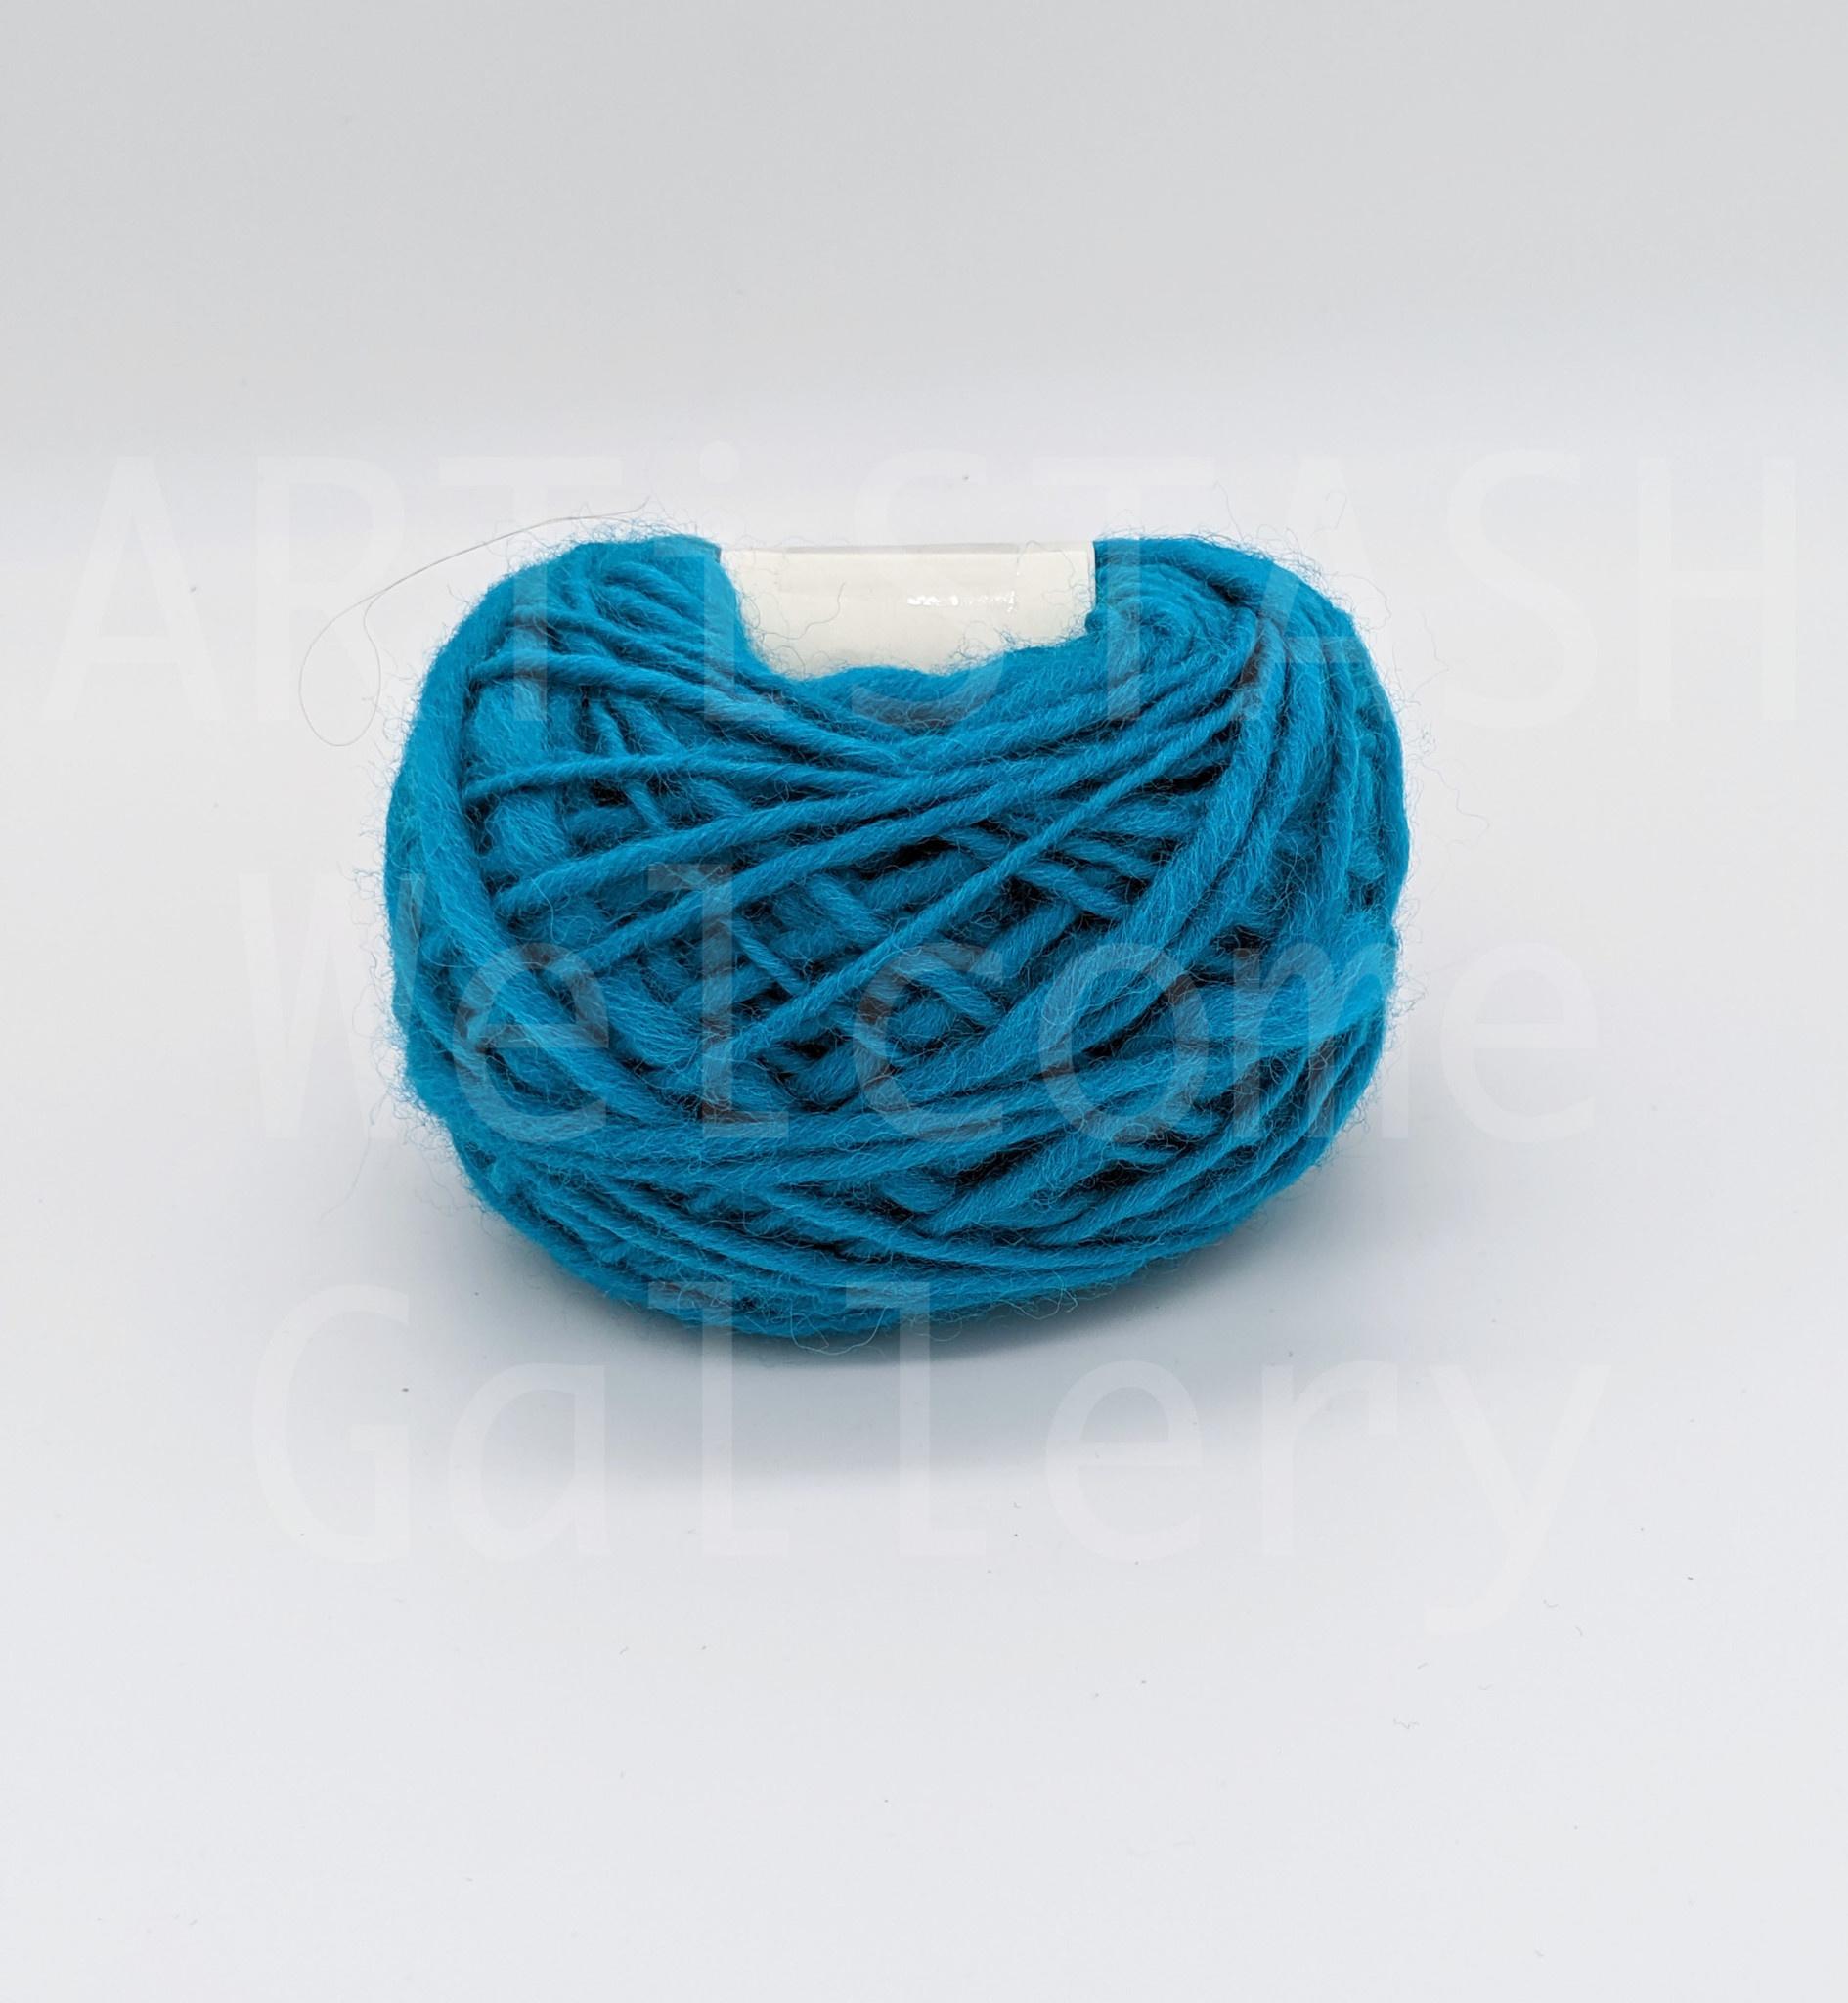 Just Sabine Hand Spun Yarn, Desert Turquoise, 28 Yards